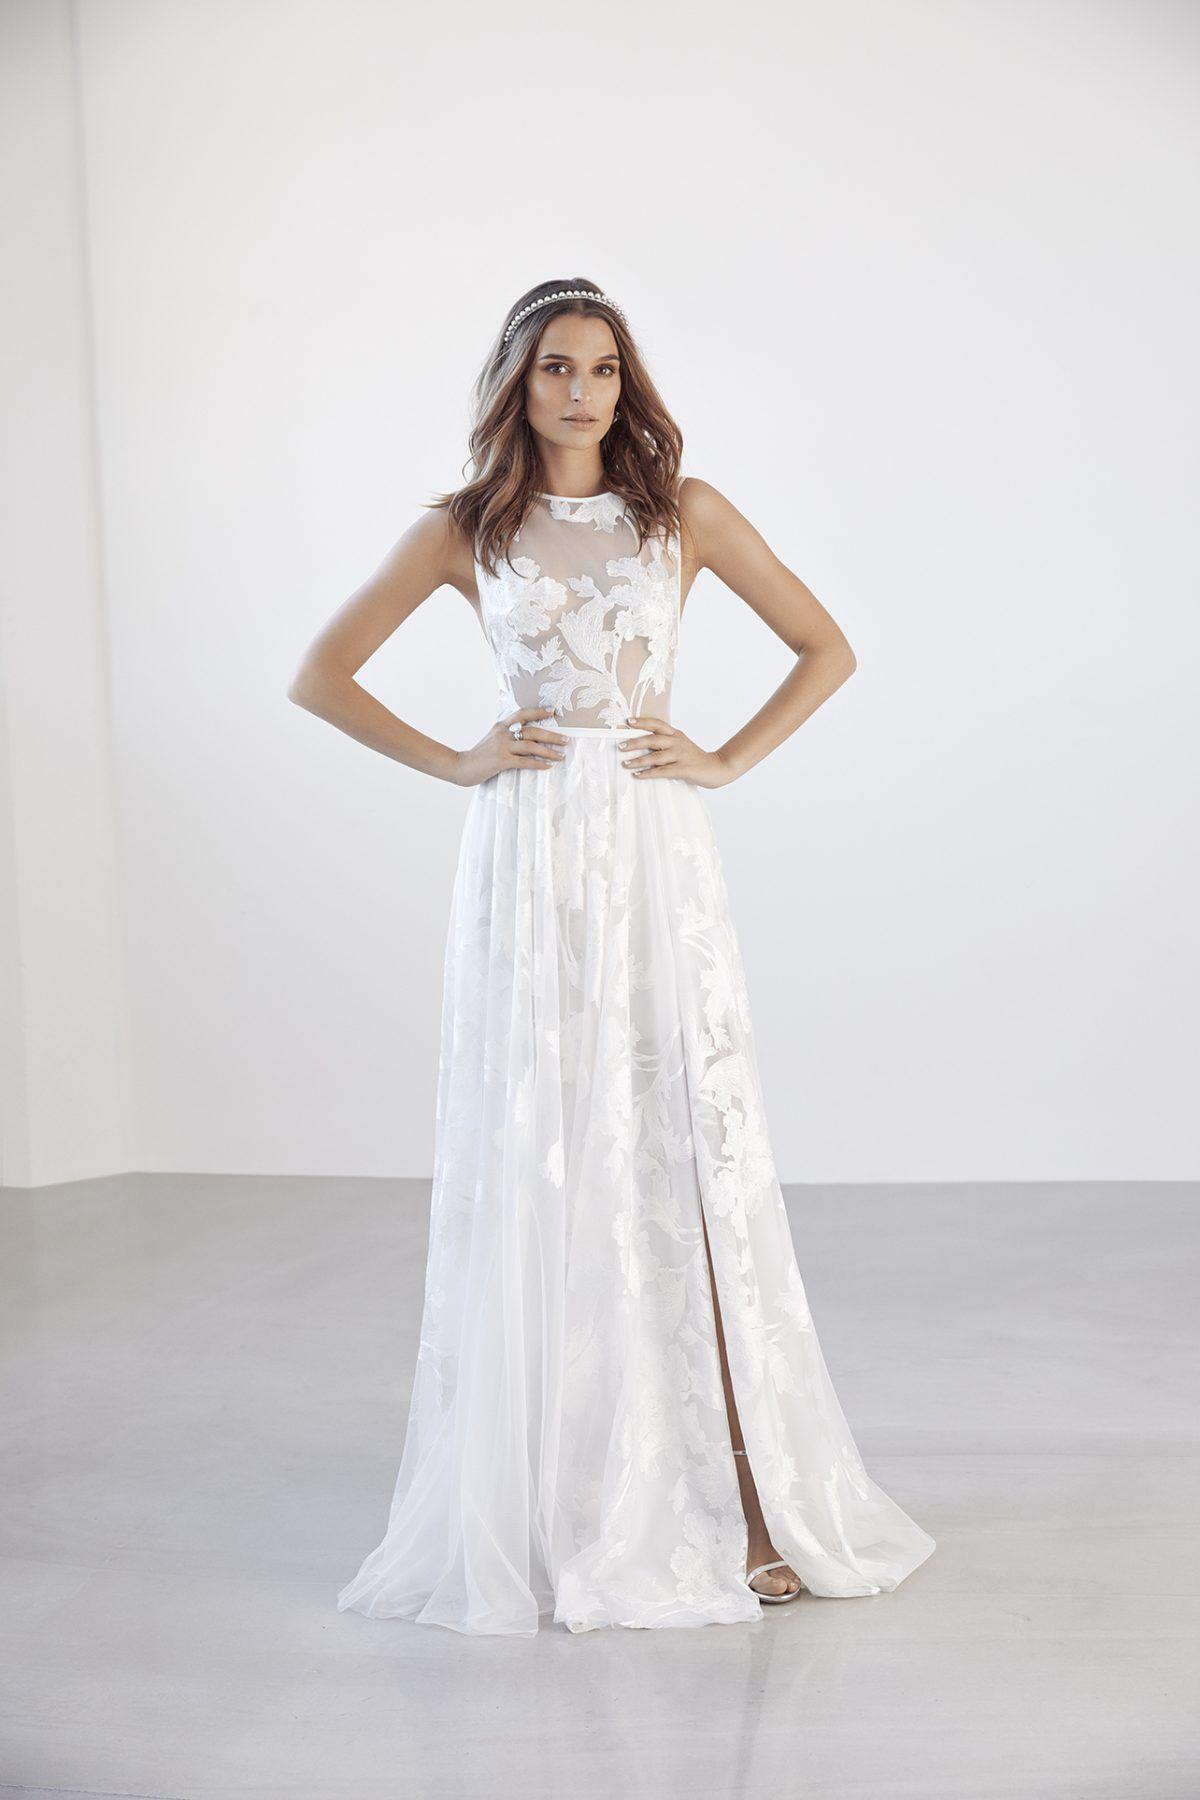 Fleur wedding dress  Sleeveless illusion floral applique Aline wedding dress with tulle